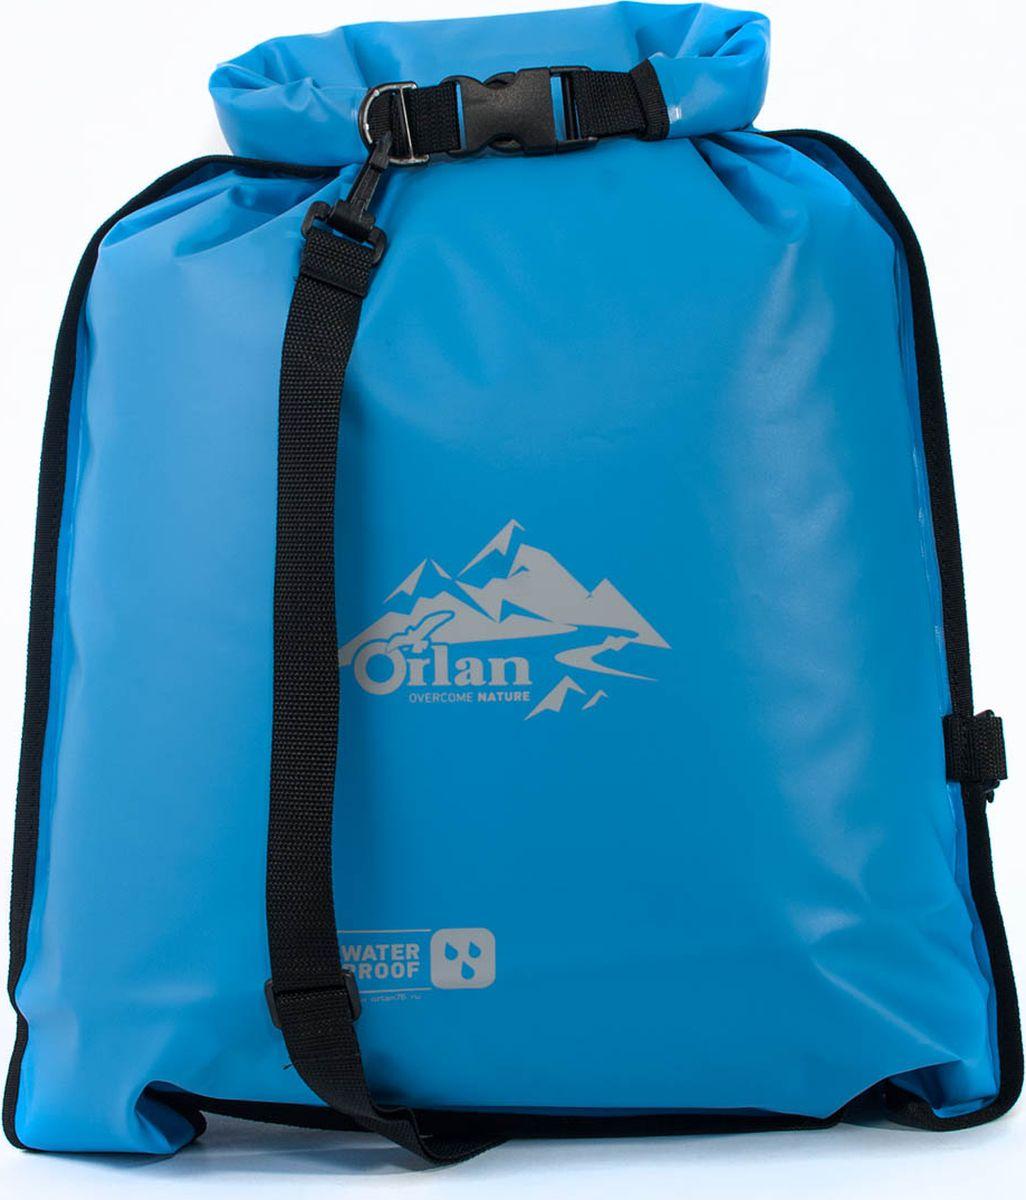 Гермомешок Orlan Компакт, цвет: голубой, 45 л гермомешок orlan компакт цвет темно синий 10 л